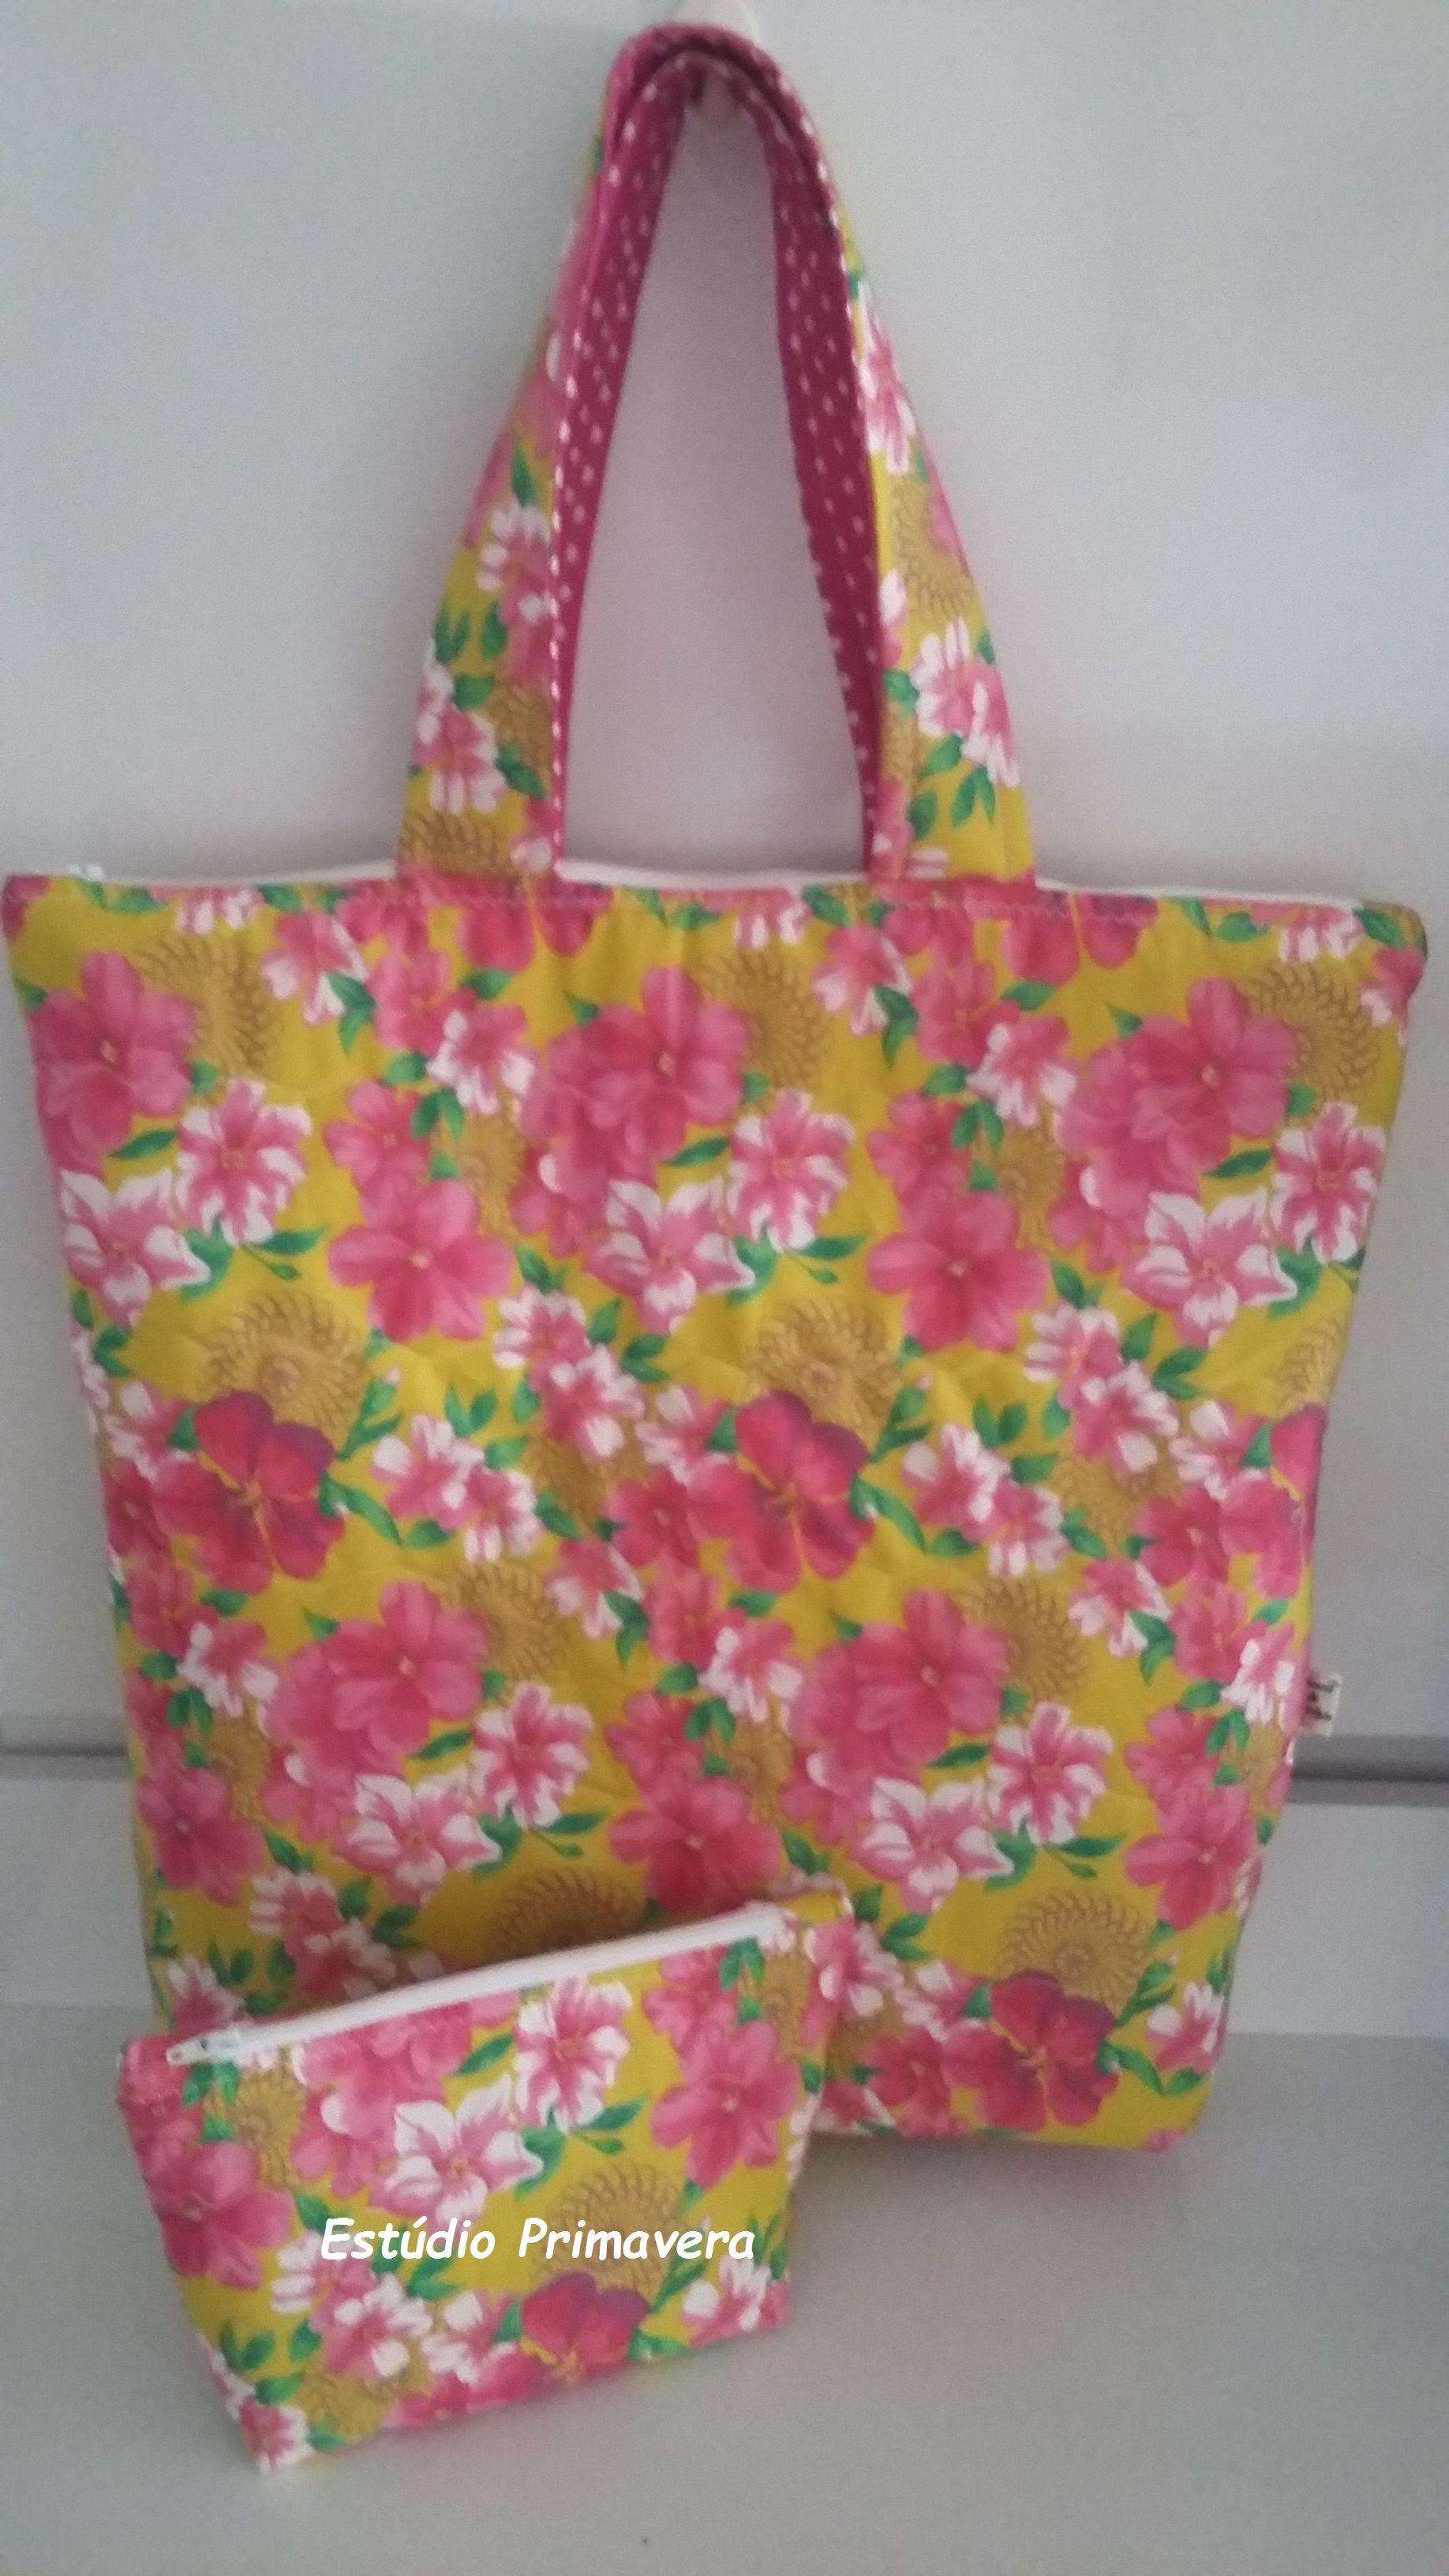 Conjunto de bolsa e necessaire em tricoline estampa floral imitando chita.